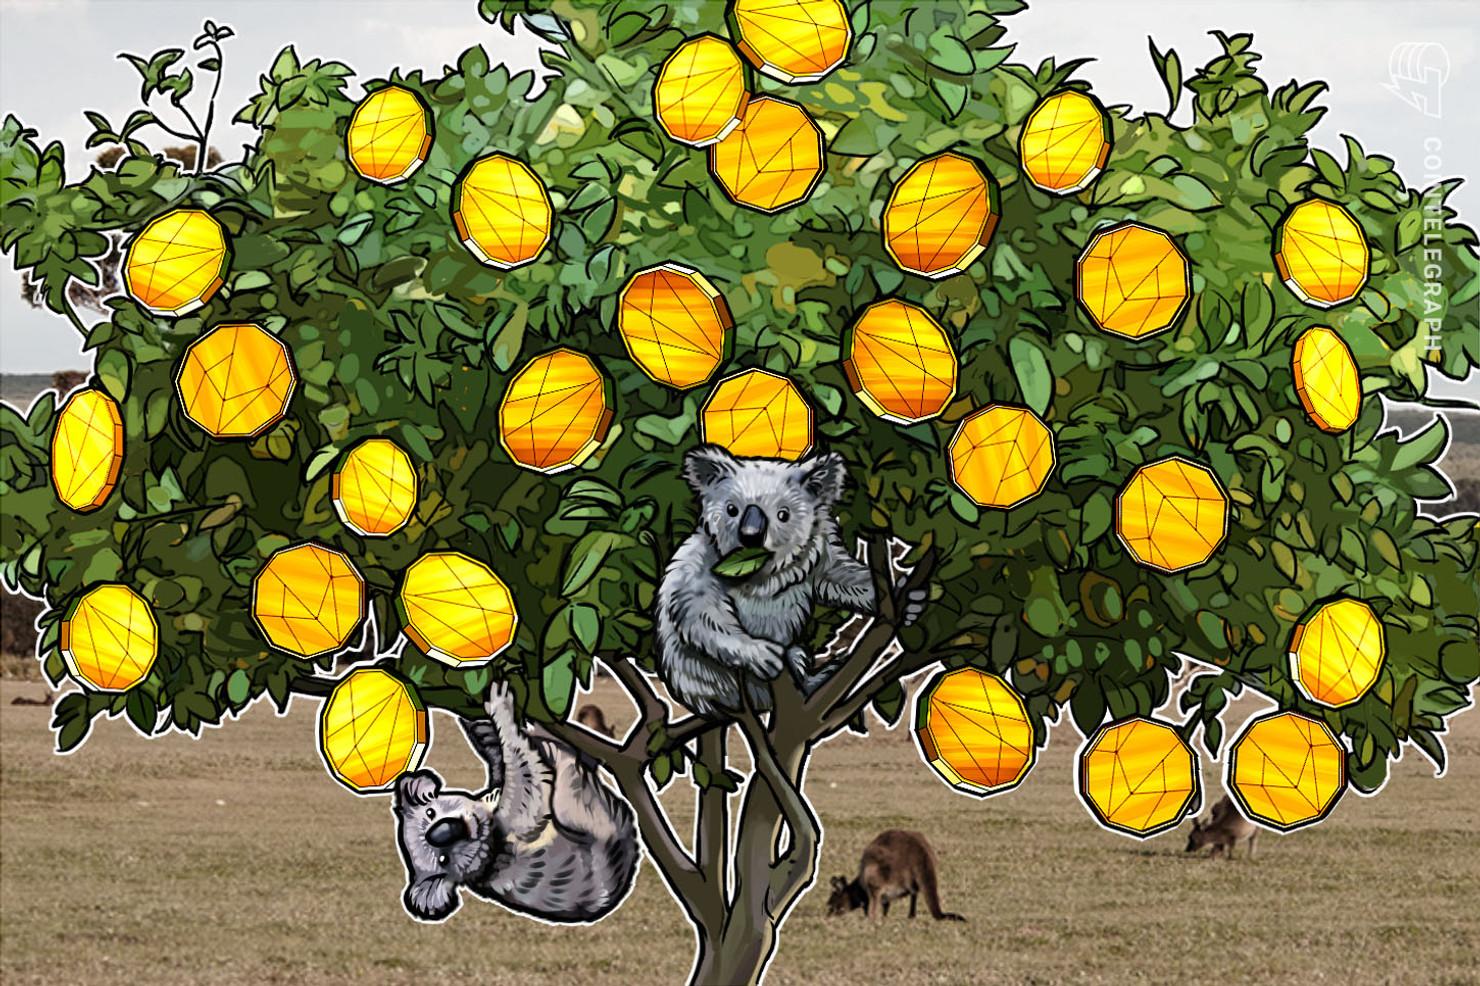 Zebpay Crypto Exchange Extends Trading Services to Australia